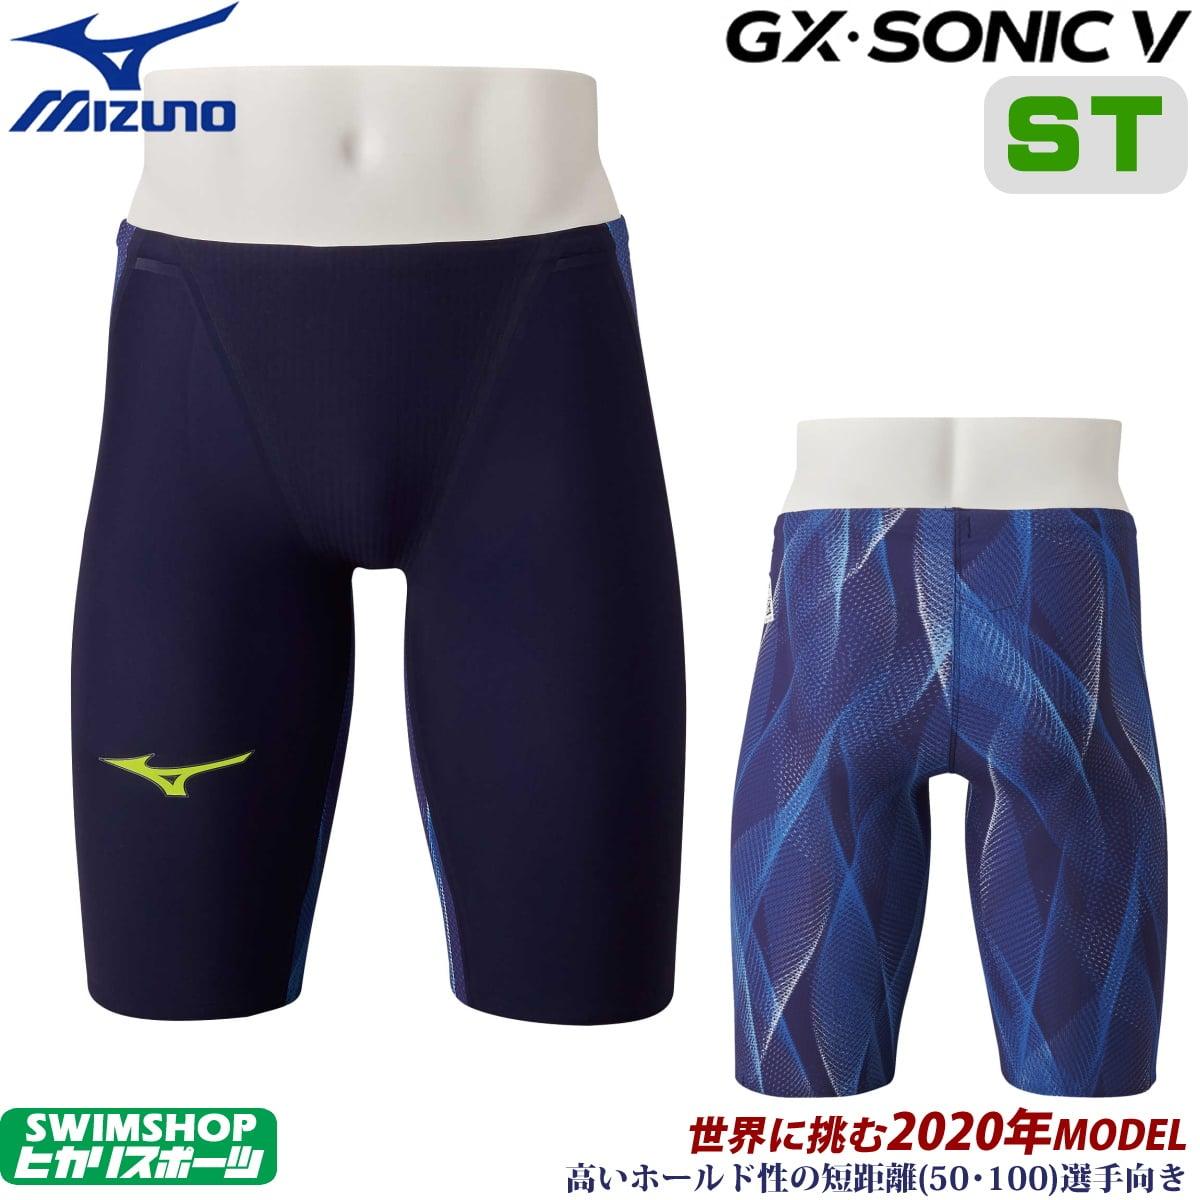 【12%OFFクーポン対象】ミズノ 競泳水着 メンズ GX SONIC5 ST スプリンター オーロラ×ブルー Fina承認 ハーフスパッツ 布帛素材 短距離 選手向き MIZUNO 高速水着 2020年モデル 男性用 N2MB0001